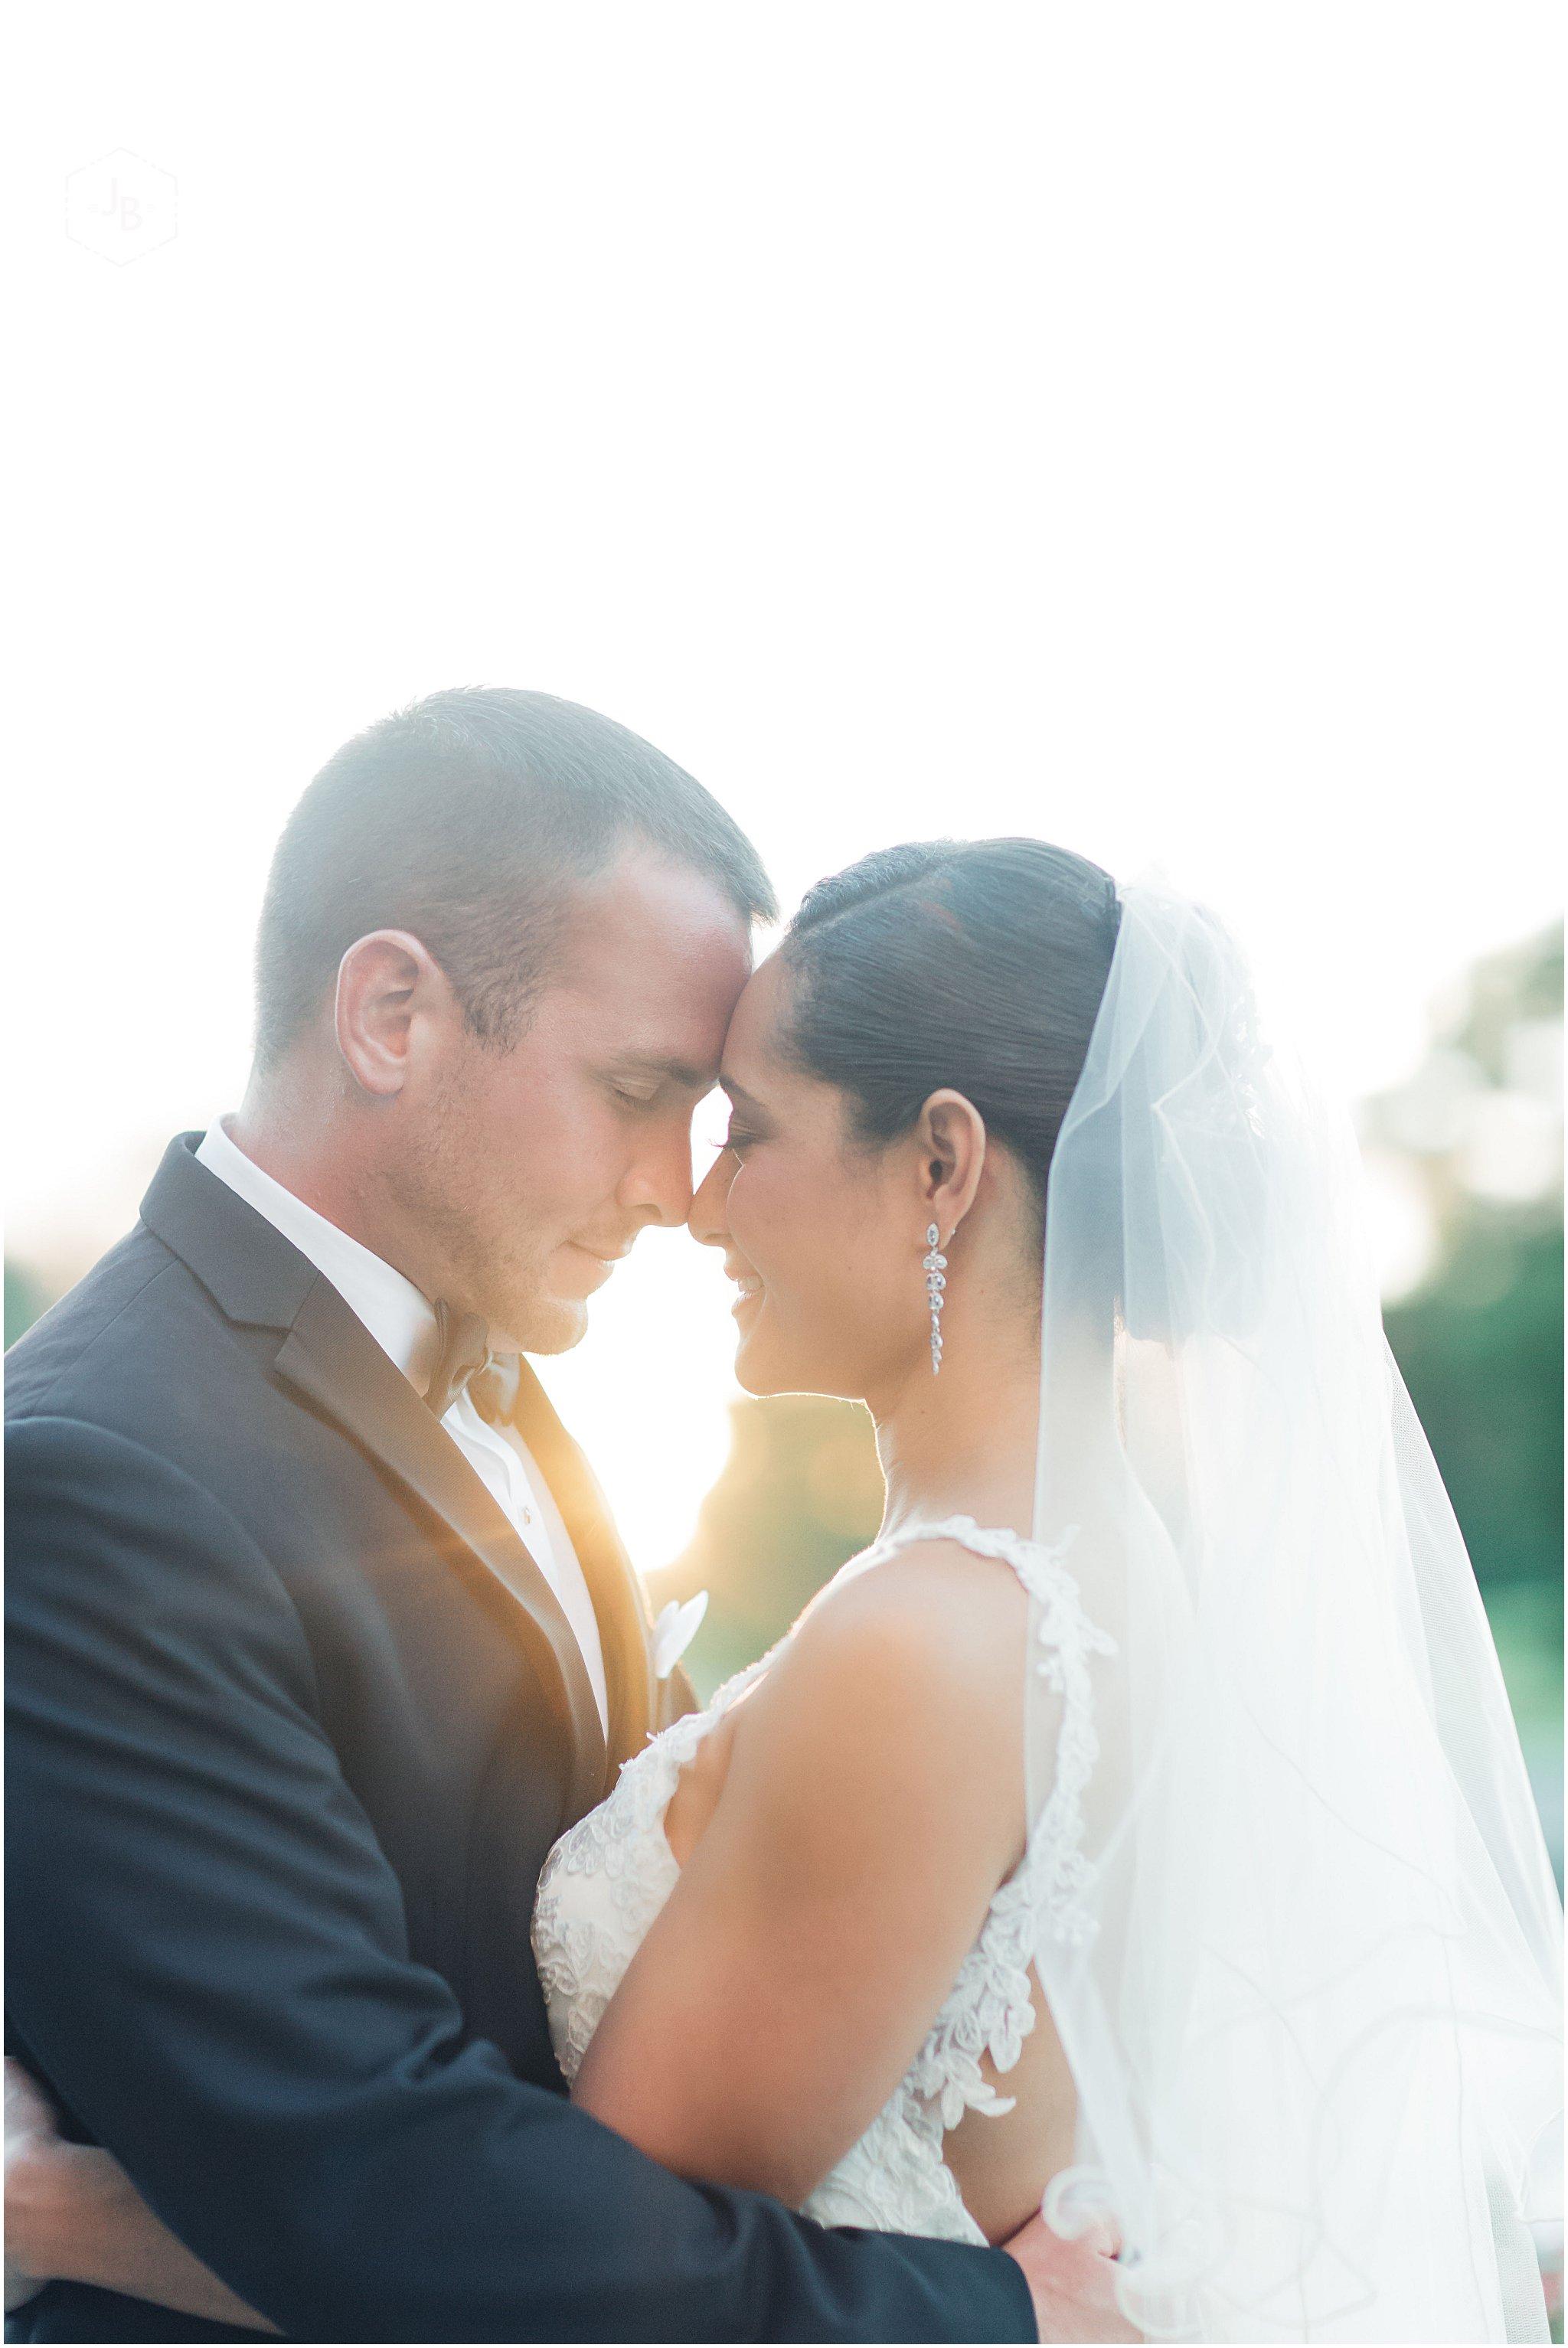 WeddingandEngagementFloridaPhotographer_0261.jpg